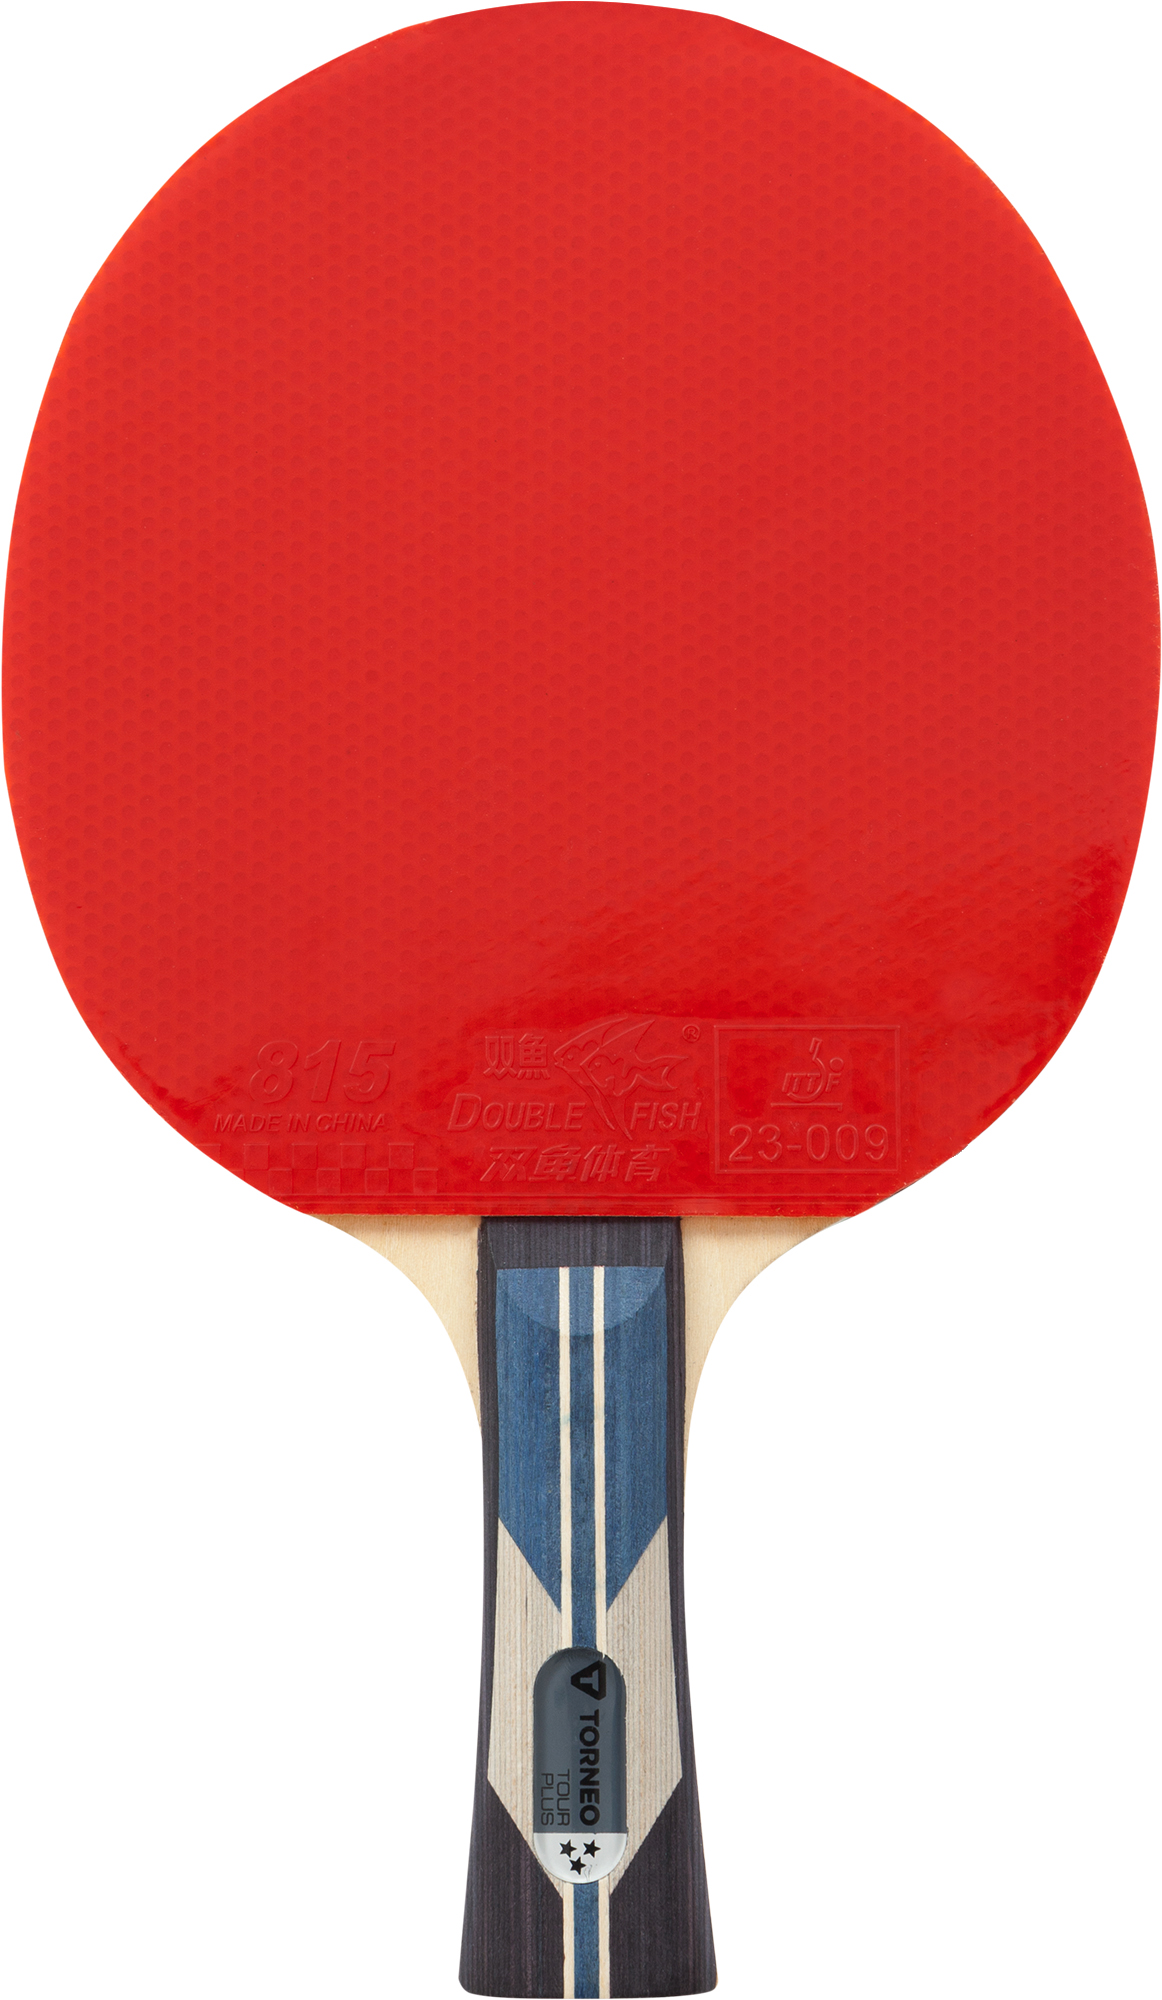 Torneo Ракетка для настольного тенниса Torneo Tour Plus torneo ракетка для настольного тенниса torneo training